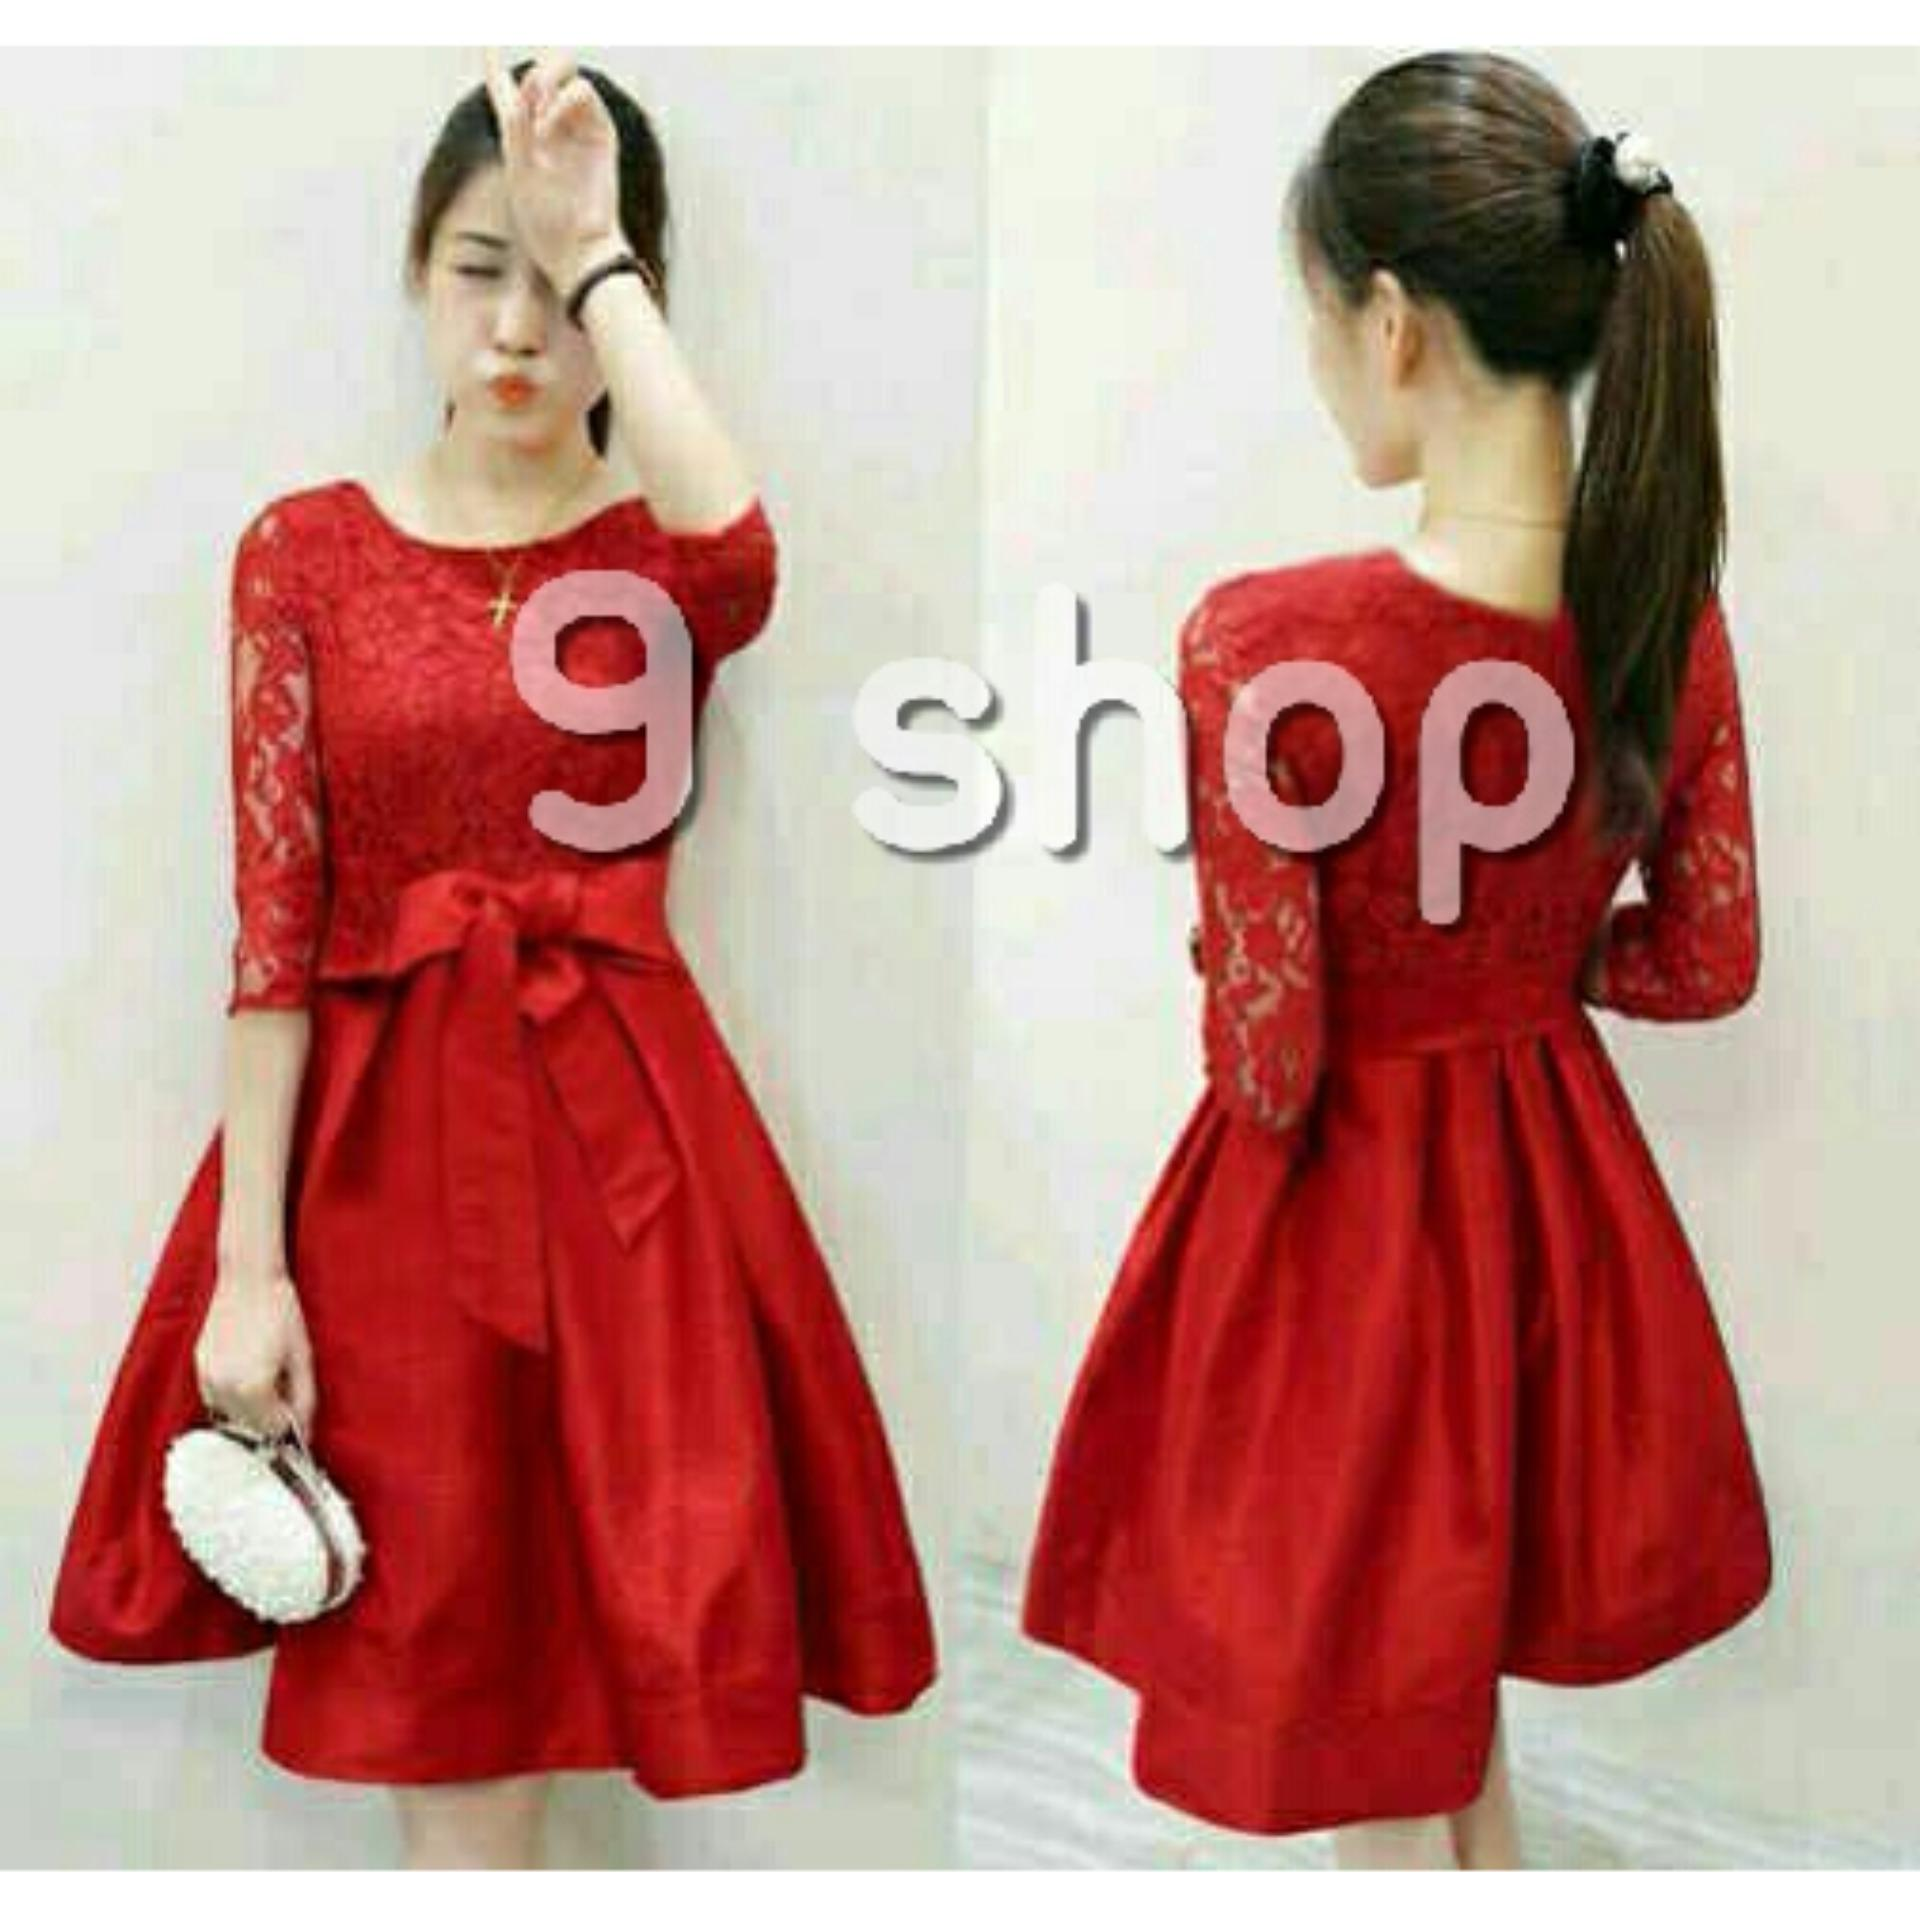 9 Shop Dress Brukat Wanita MERLI / Dress Korea / Dress Renda / Lace Dress /